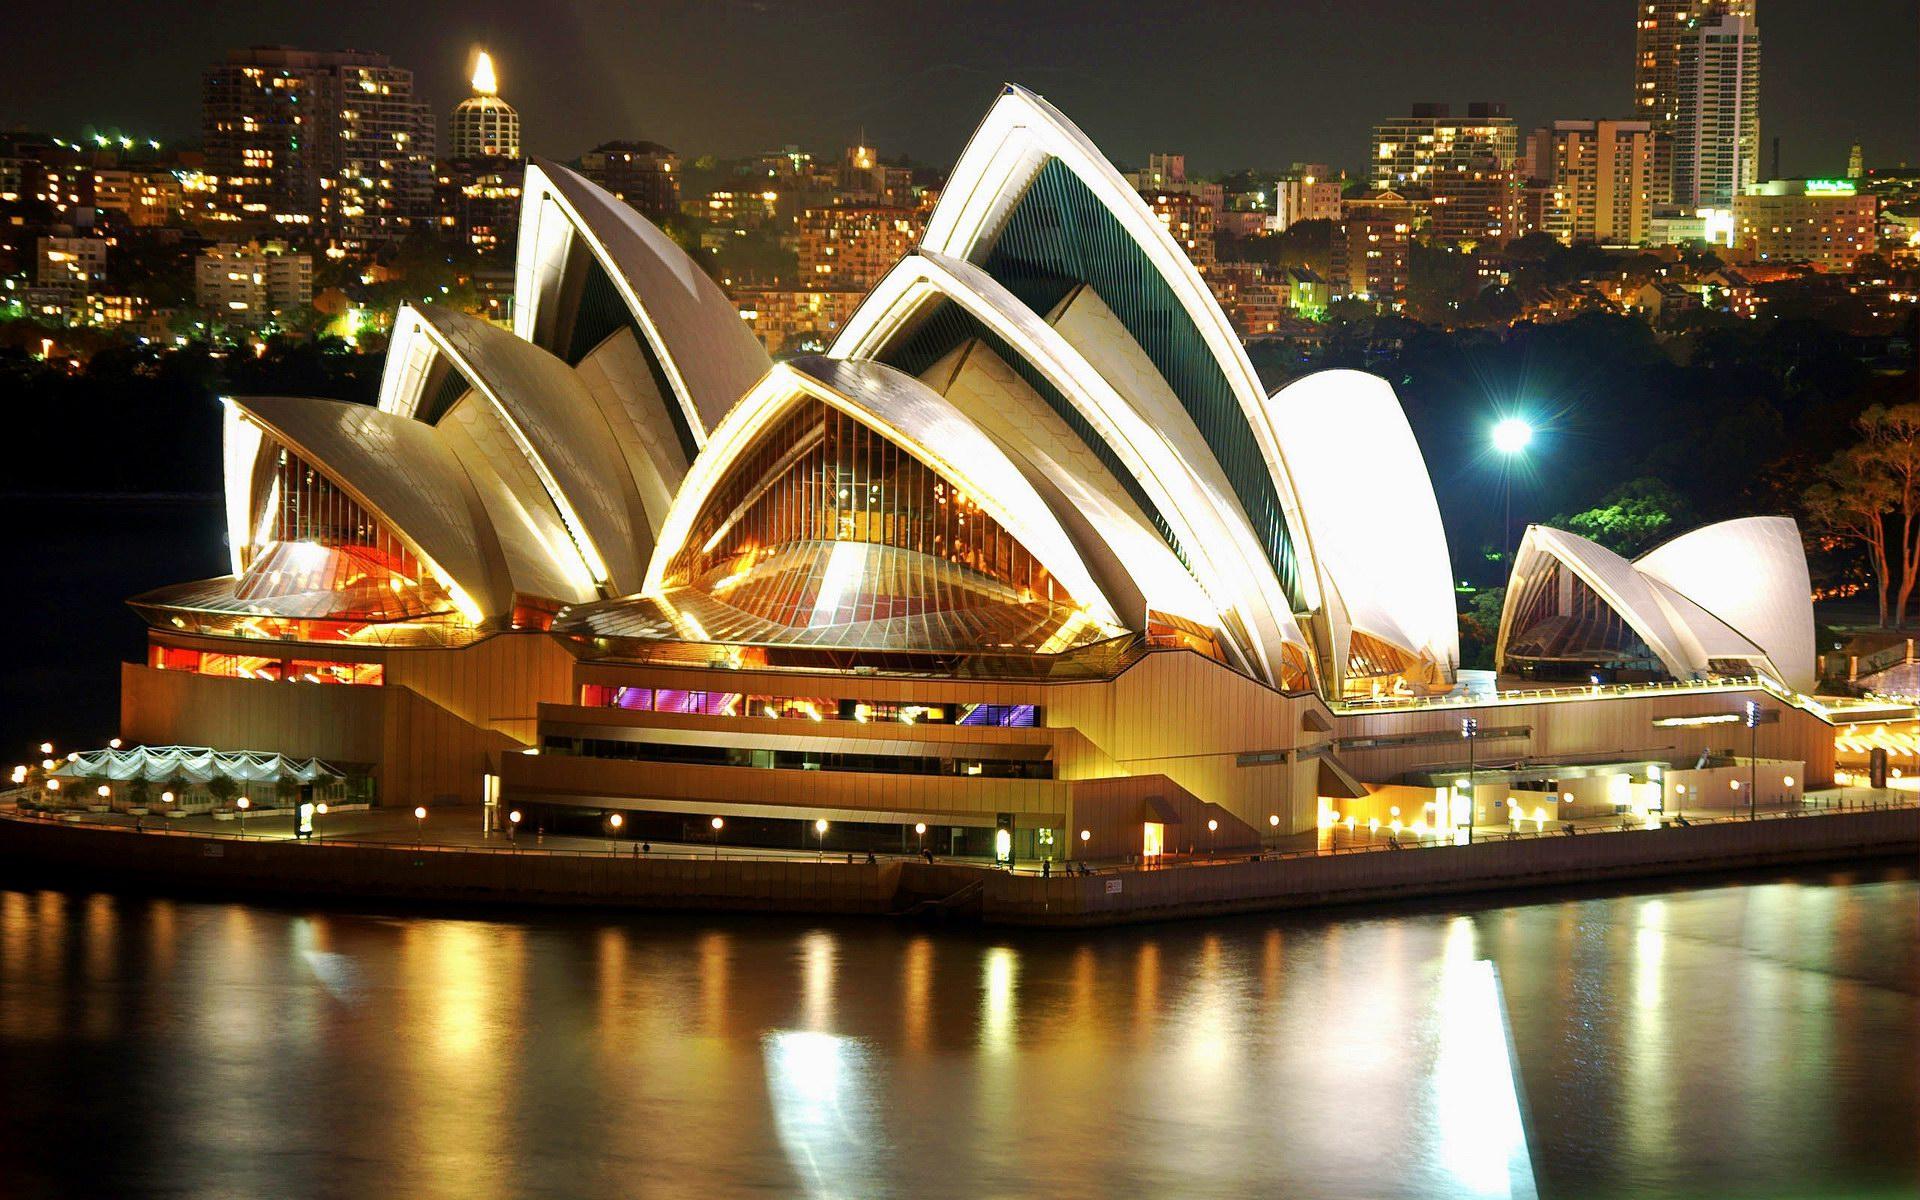 Sydney Opera House Stunning Wallpaper   Travel HD Wallpapers 1920x1200